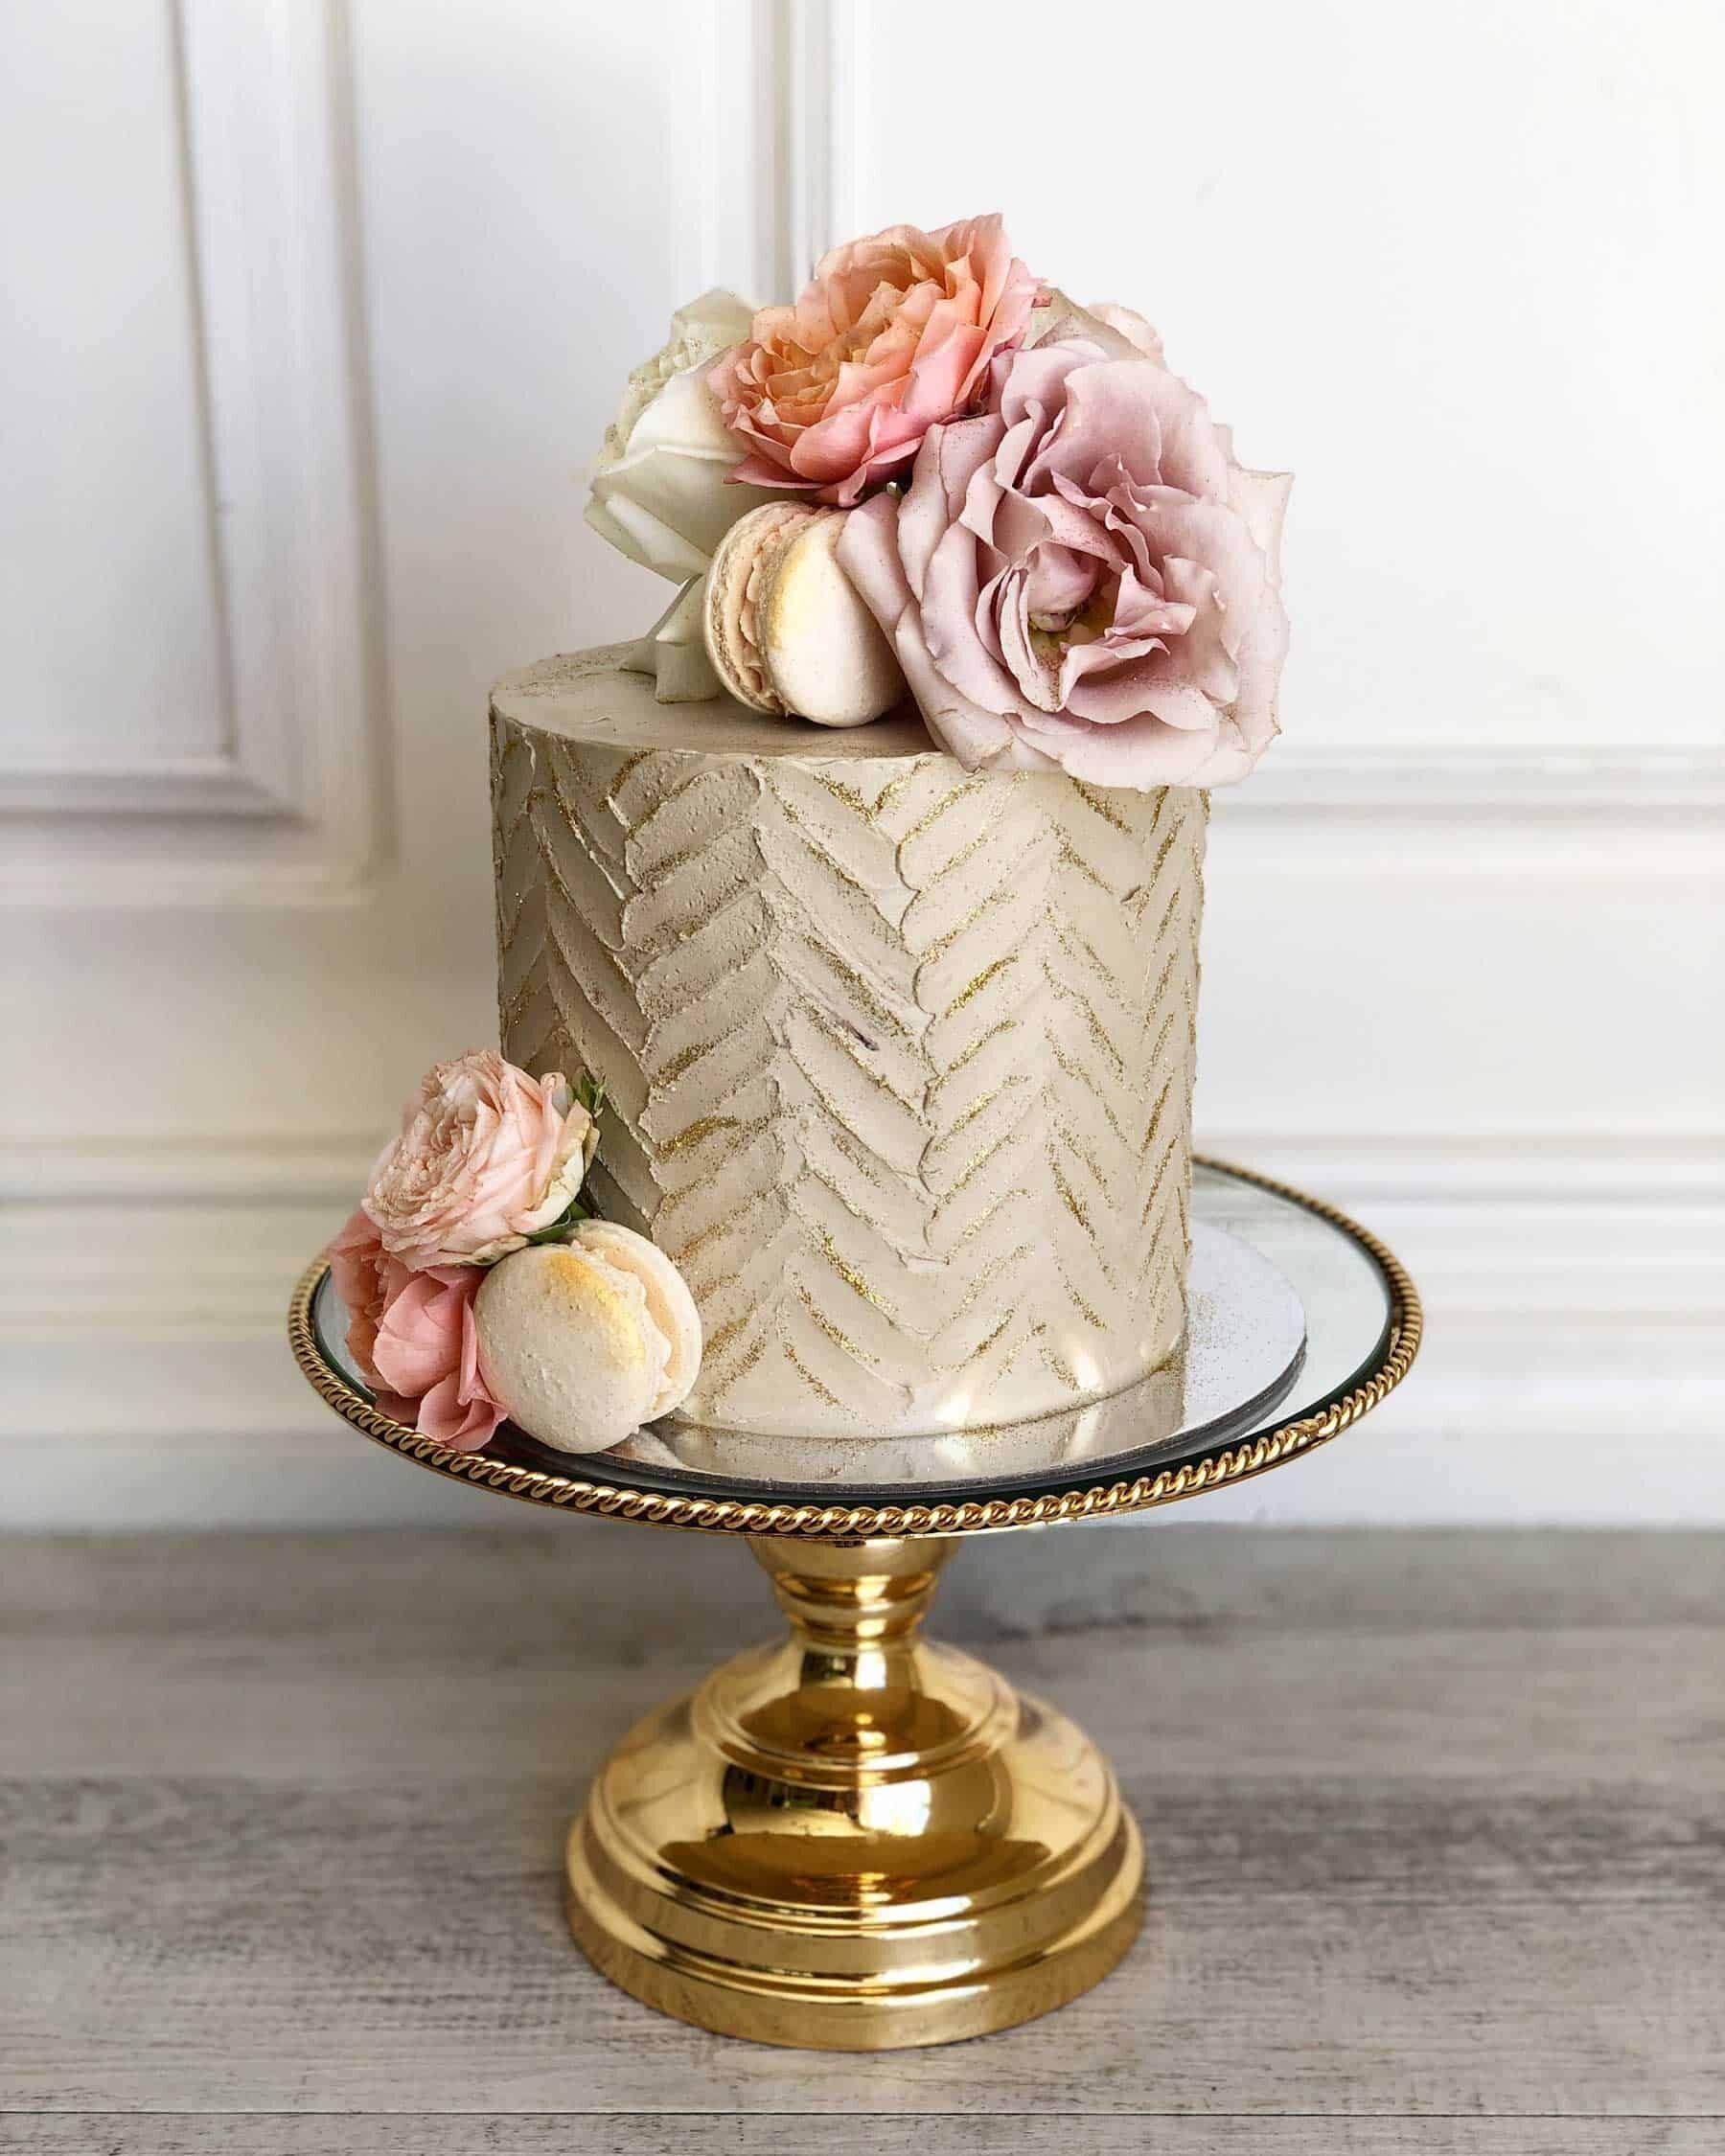 artisnal wedding cakes in Perth WA - Posh Little Cakes